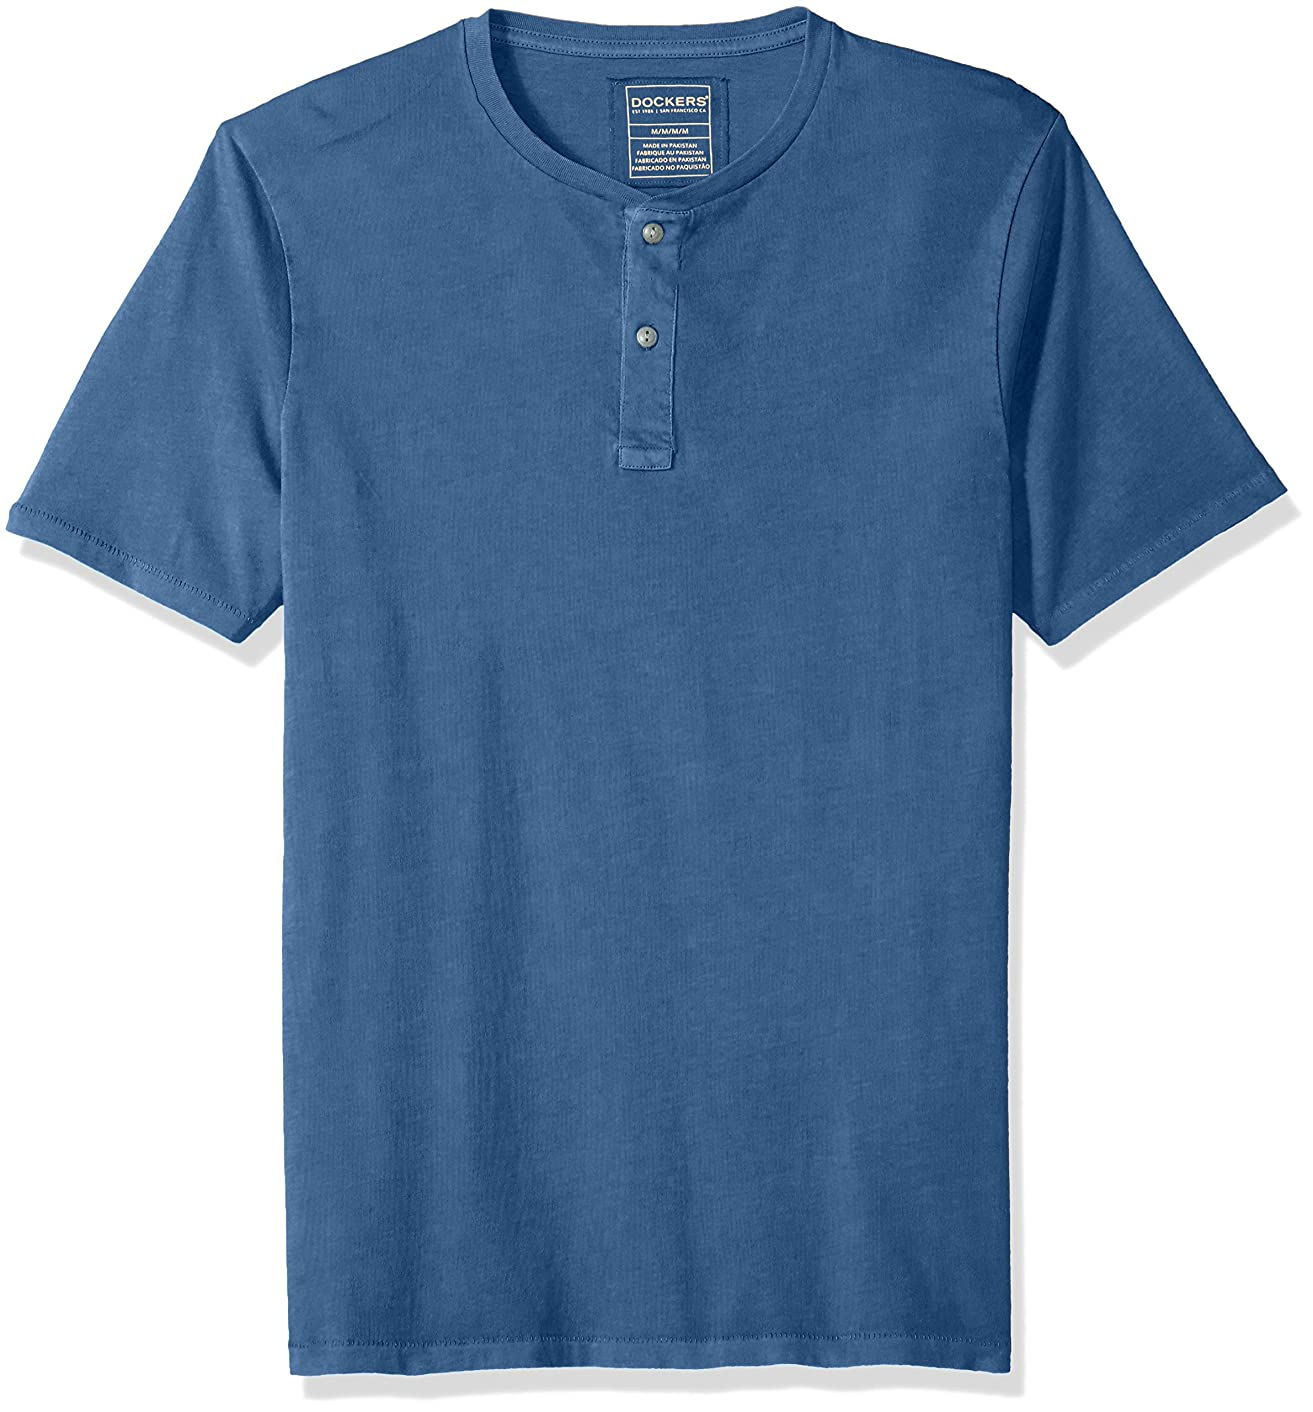 Dockers Men's Short Sleeve Garment Dye Henley Shirt